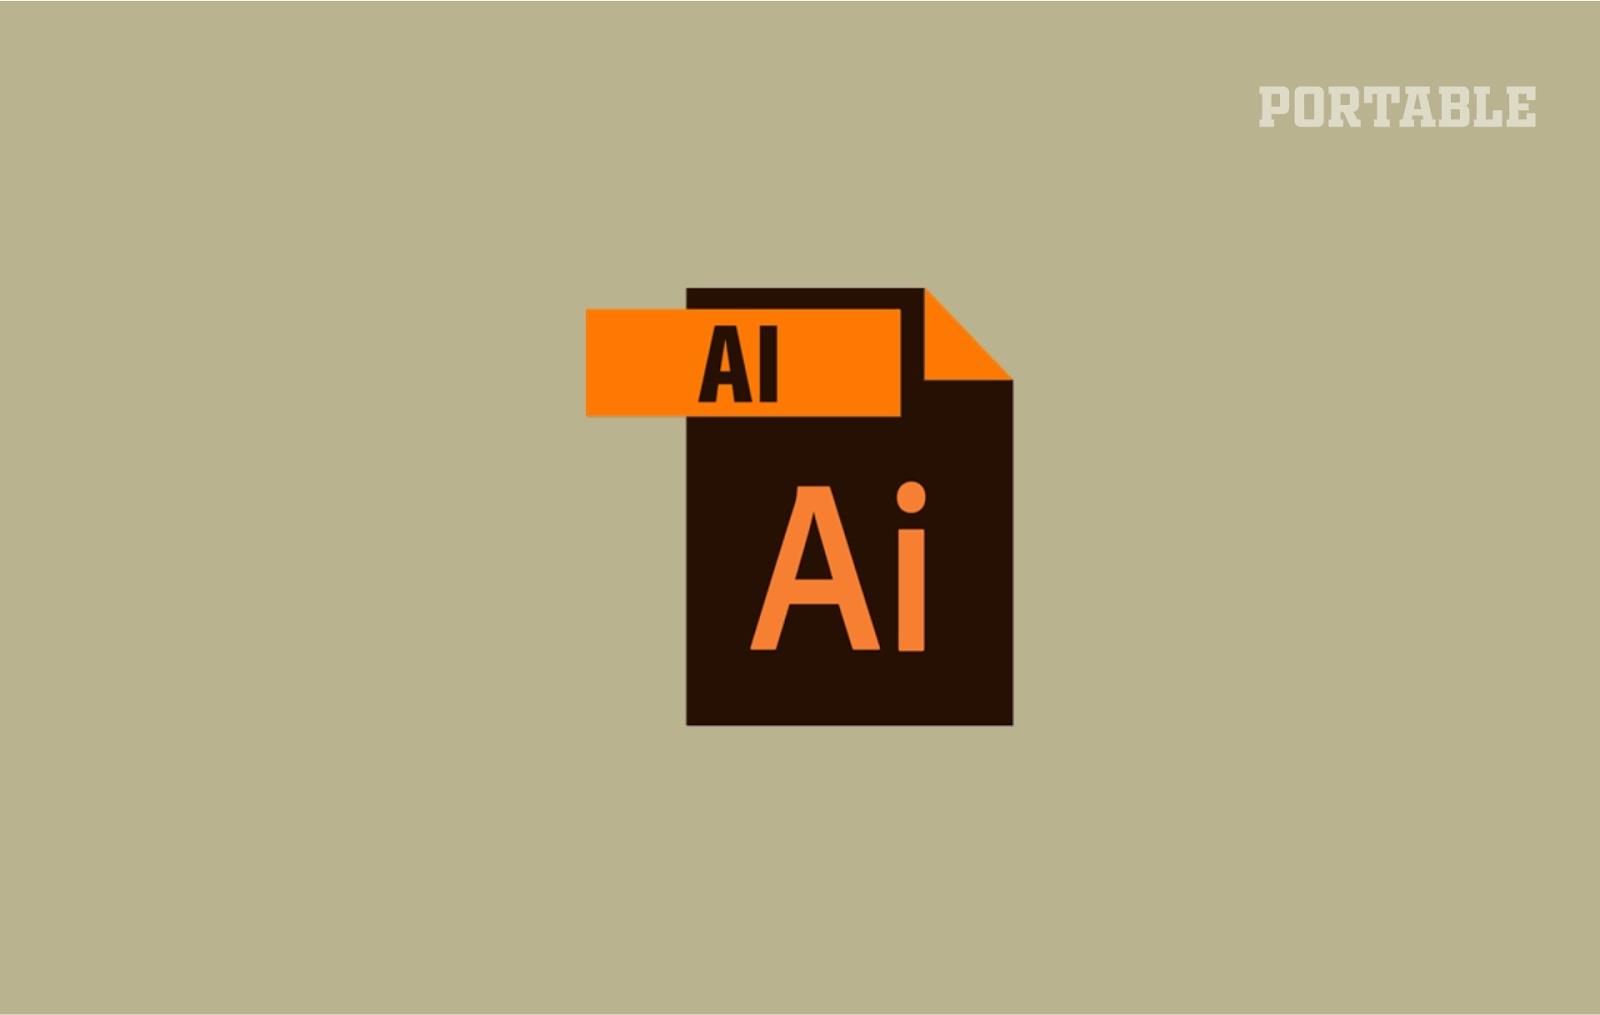 adobe illustrator cs6 portable free download full version